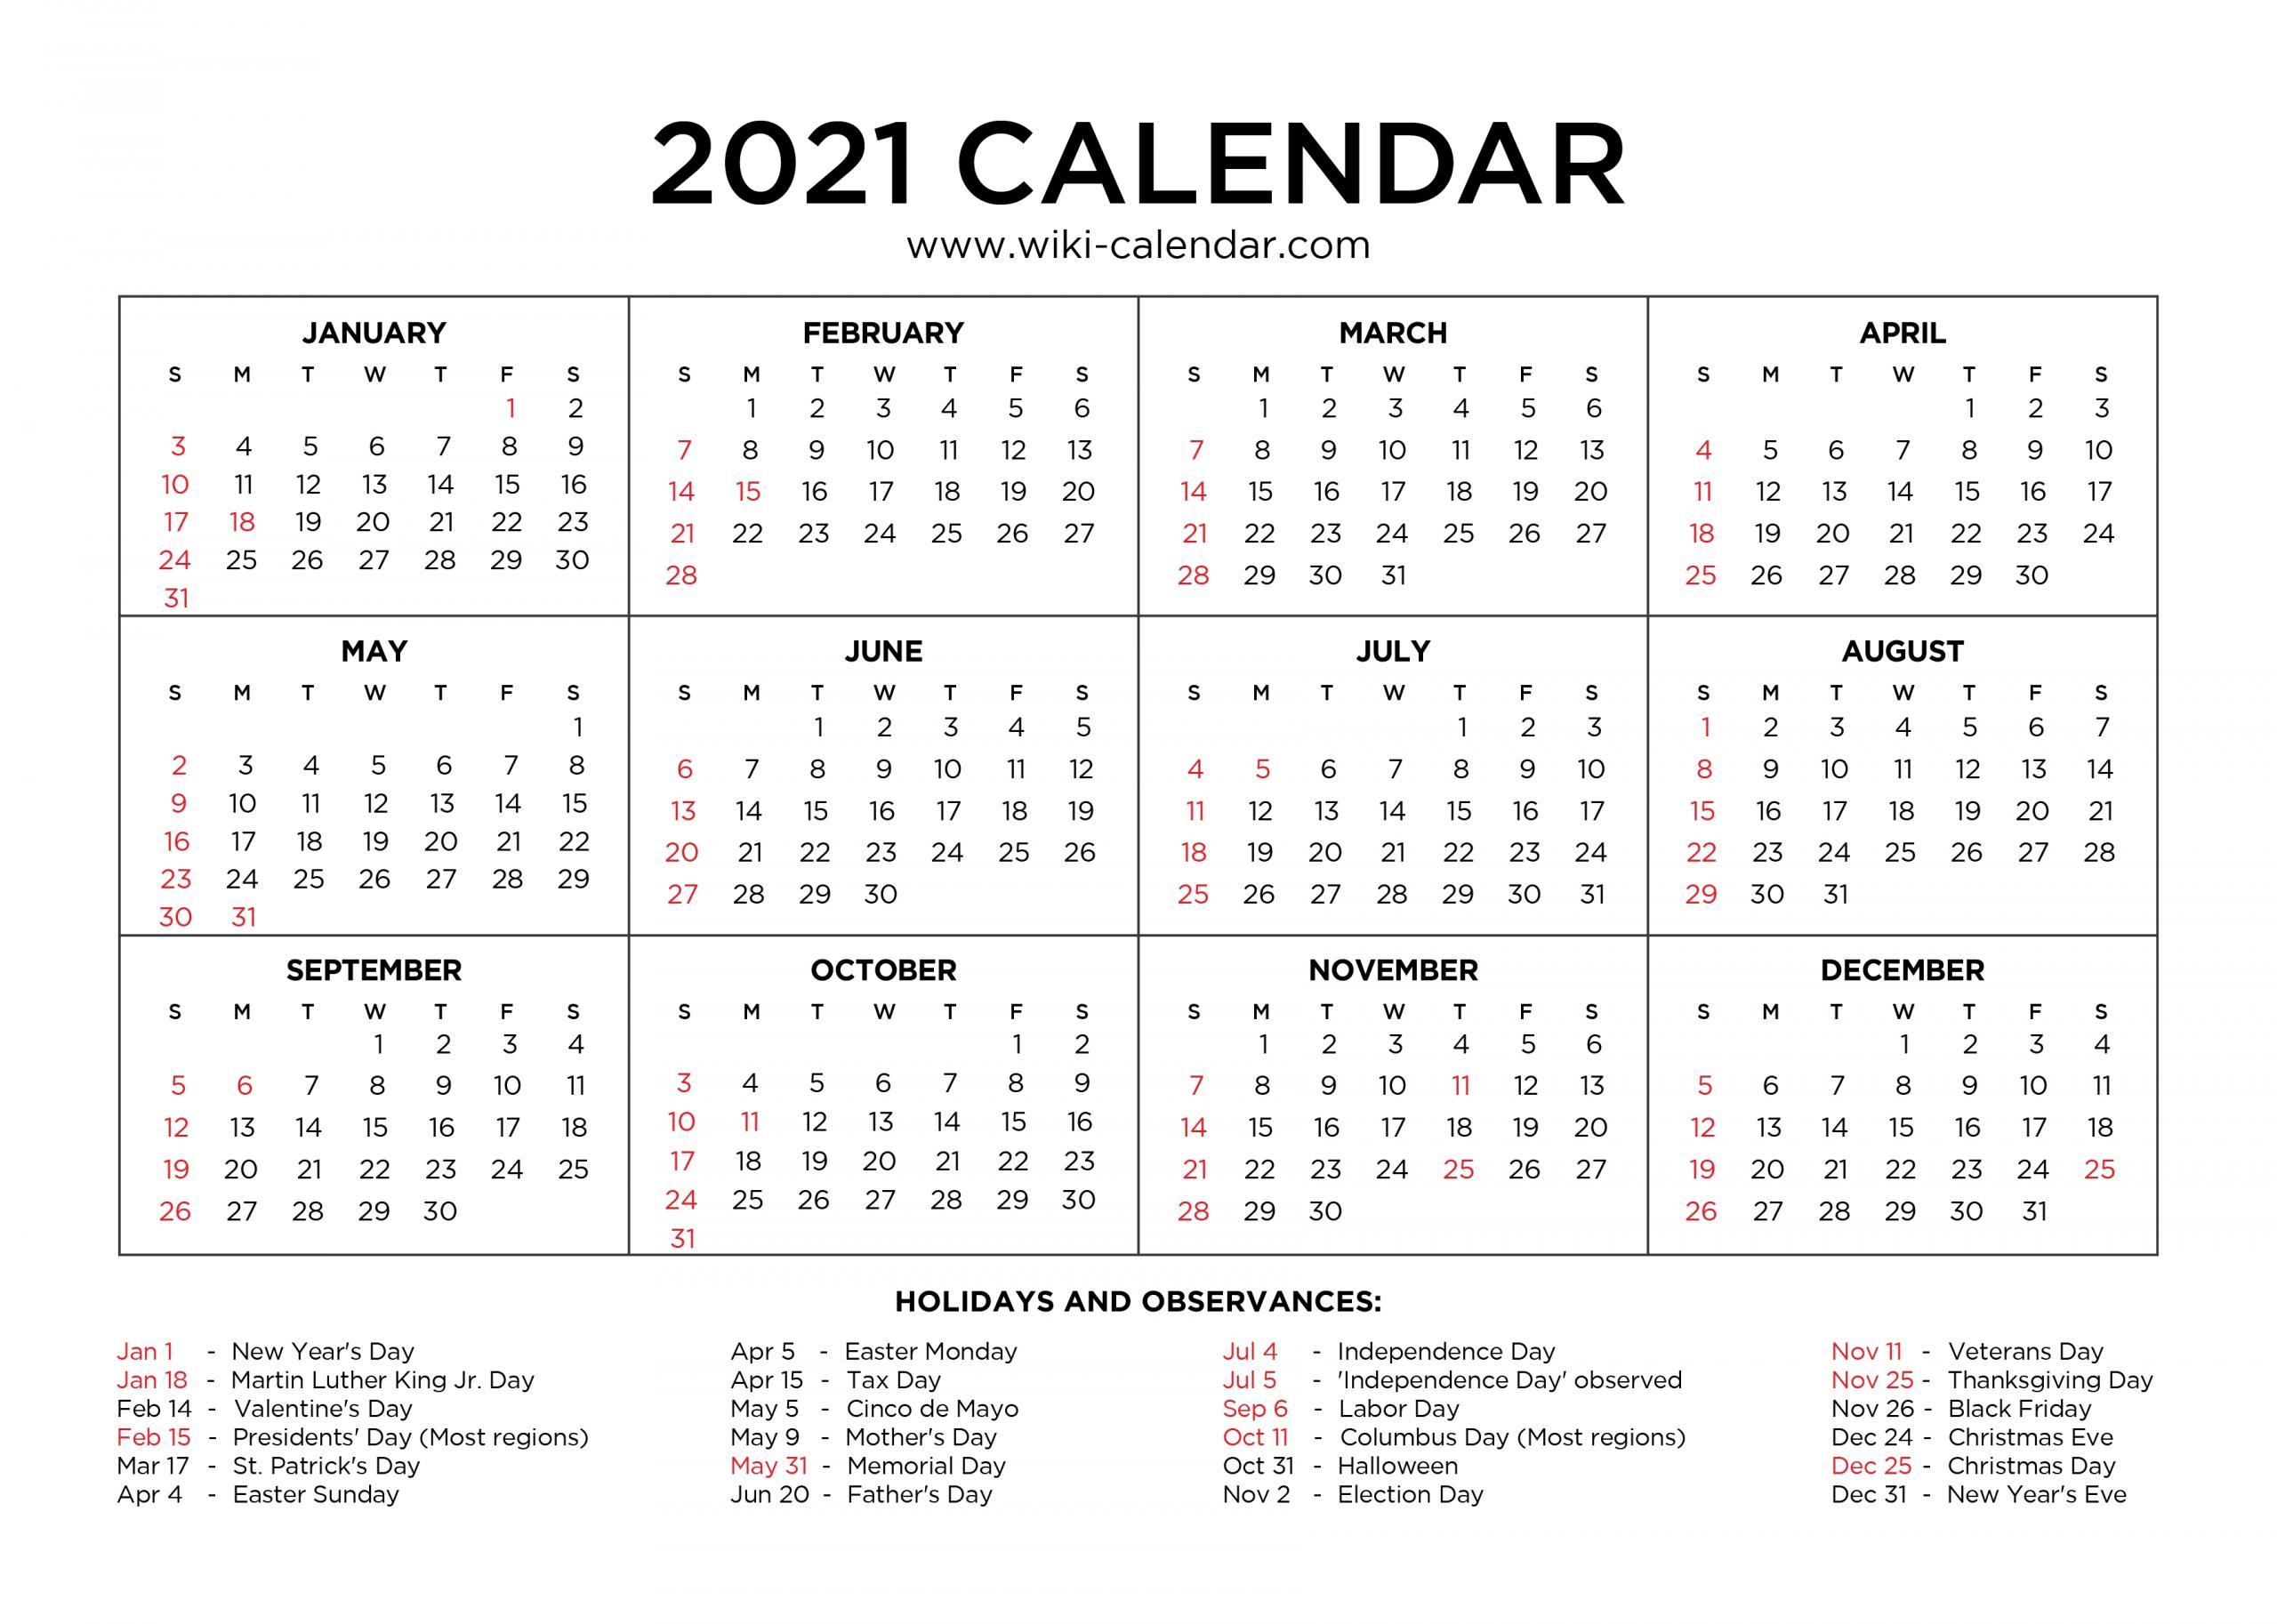 Download And Print Calendars For 2020, 2021 - Wiki Calendar-4X6 Printable Calendar 2021 Free